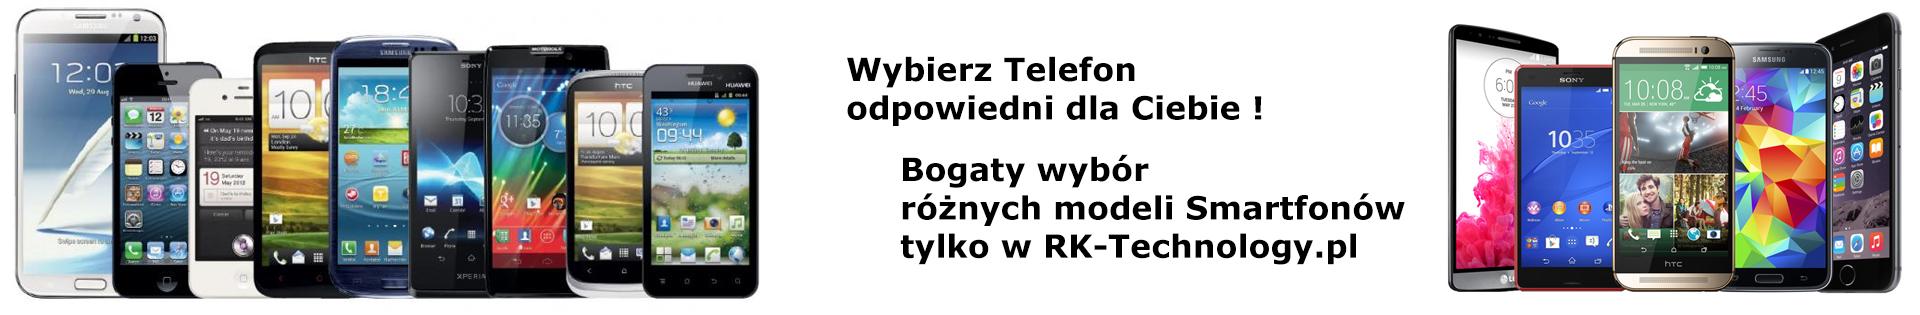 RK-Technology.pl